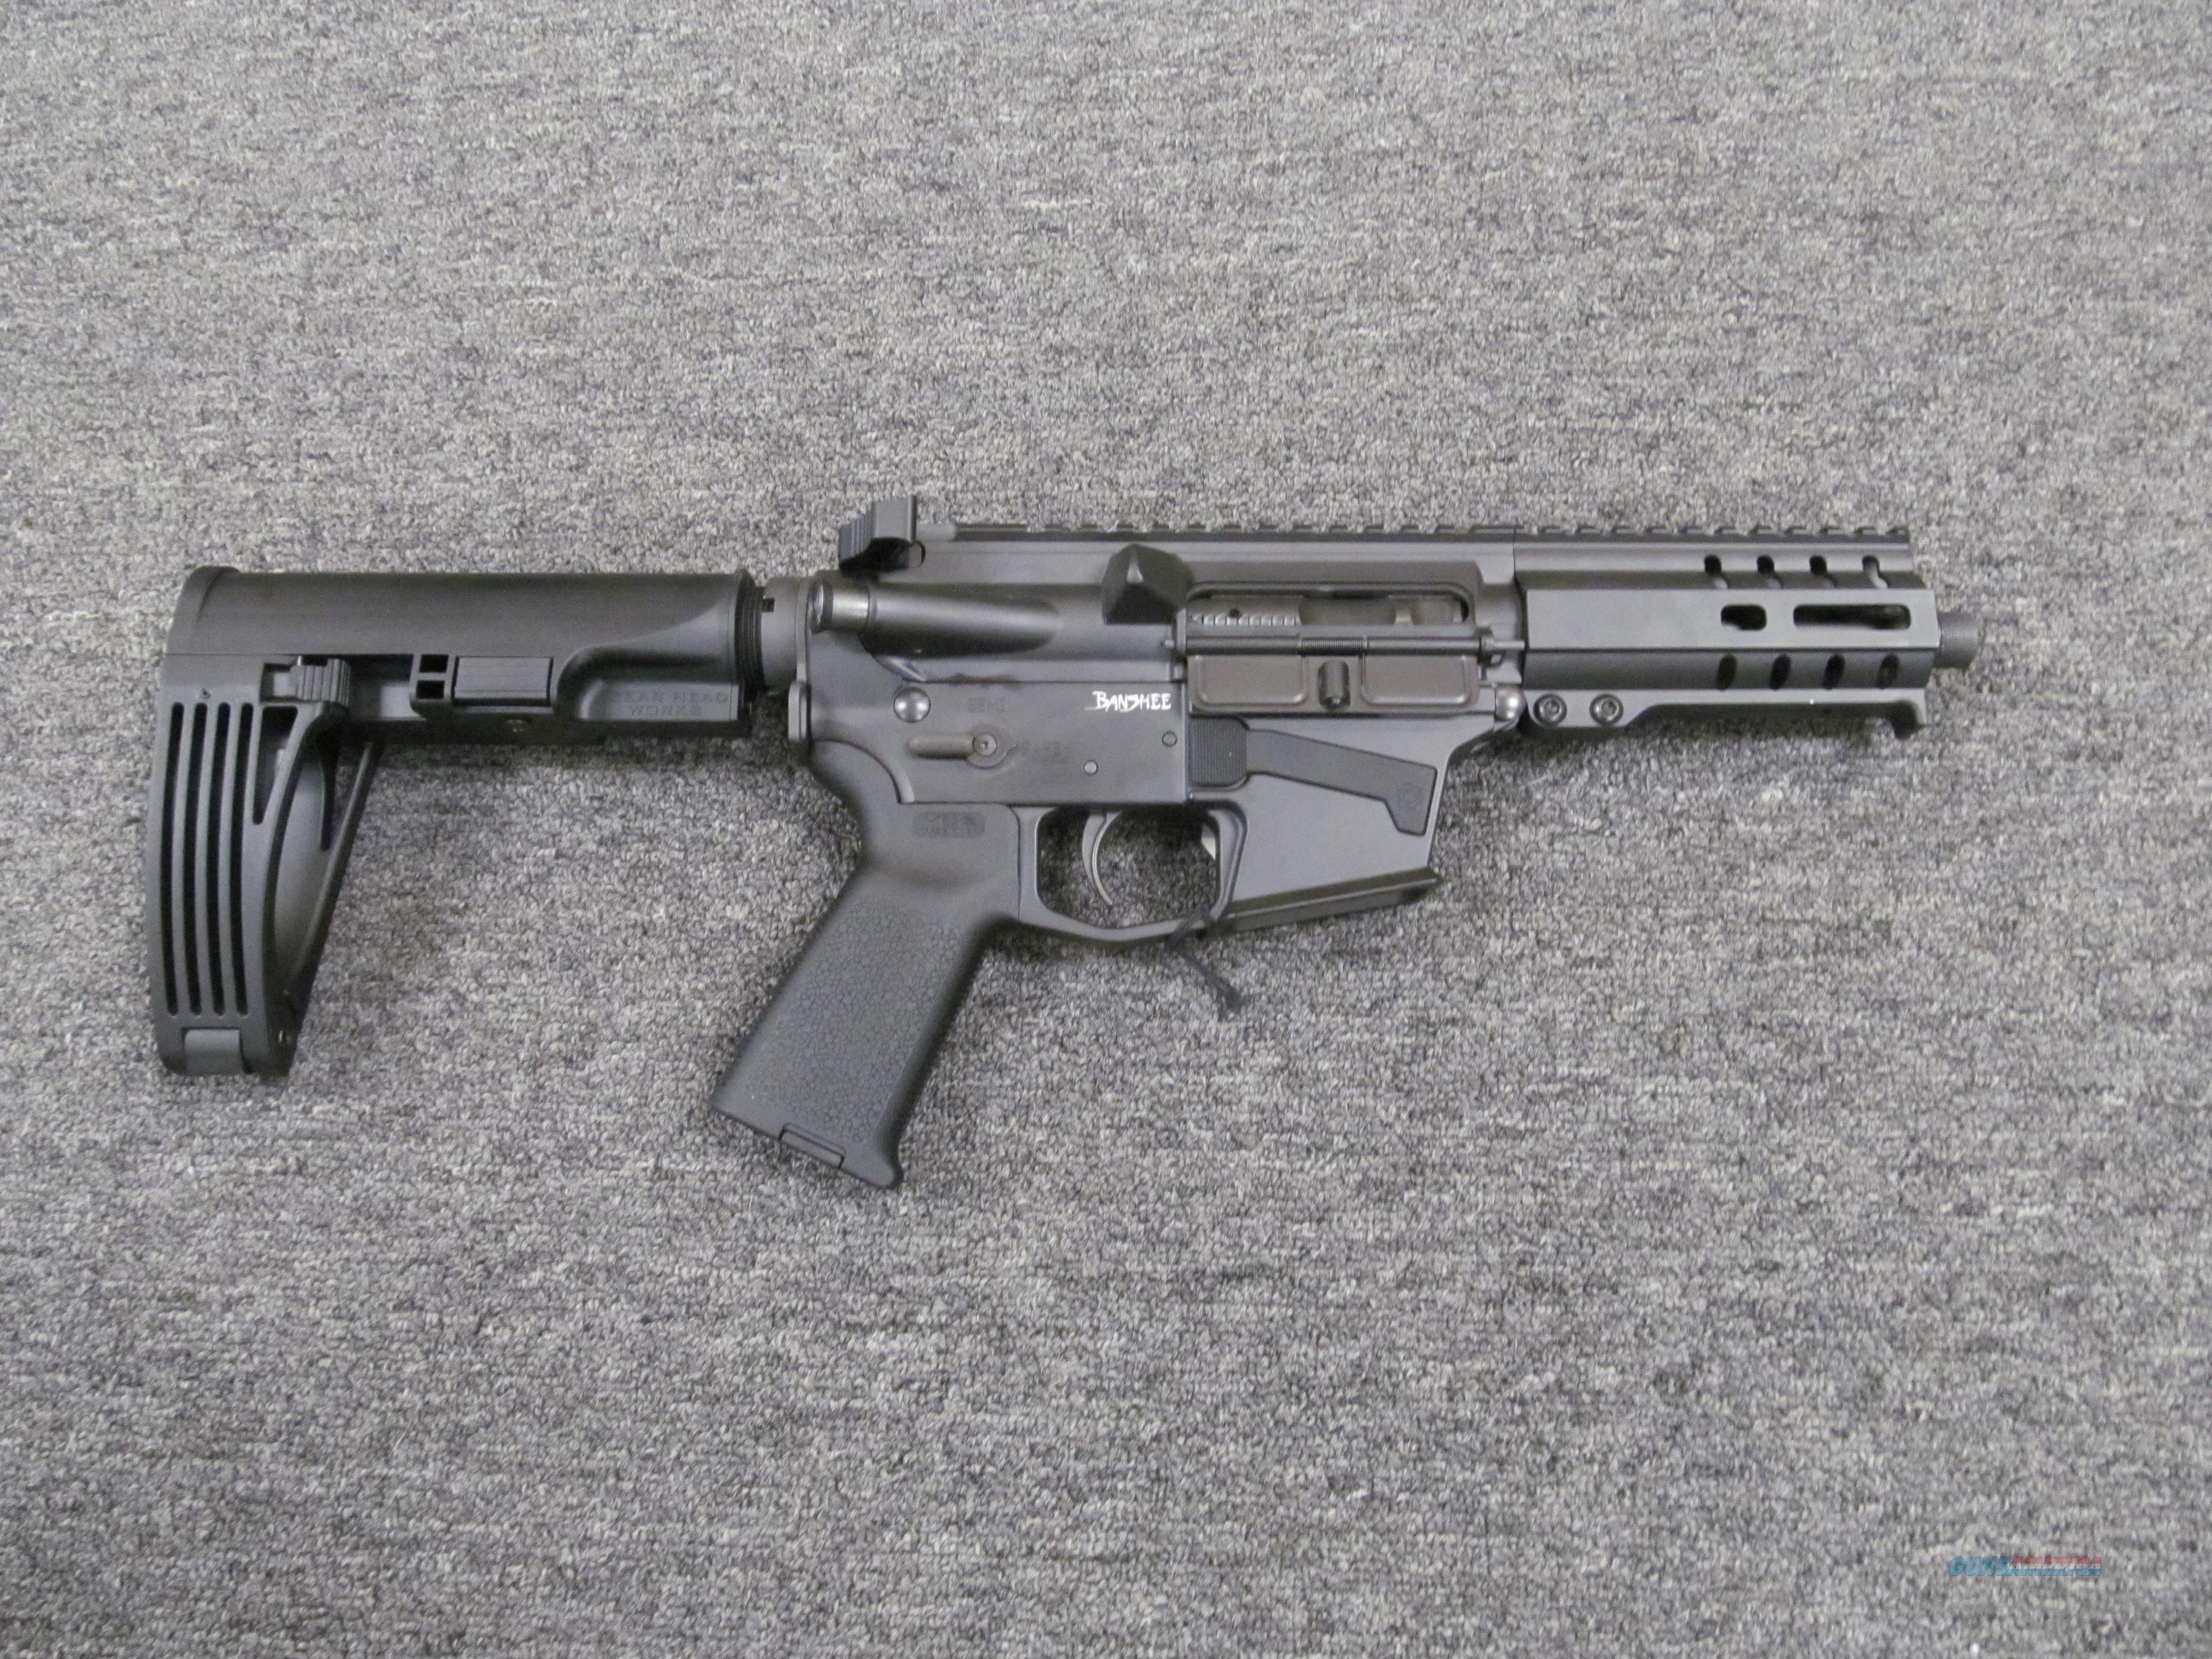 CMMG MK57 Banshee  Guns > Pistols > CMMG > CMMG Pistols